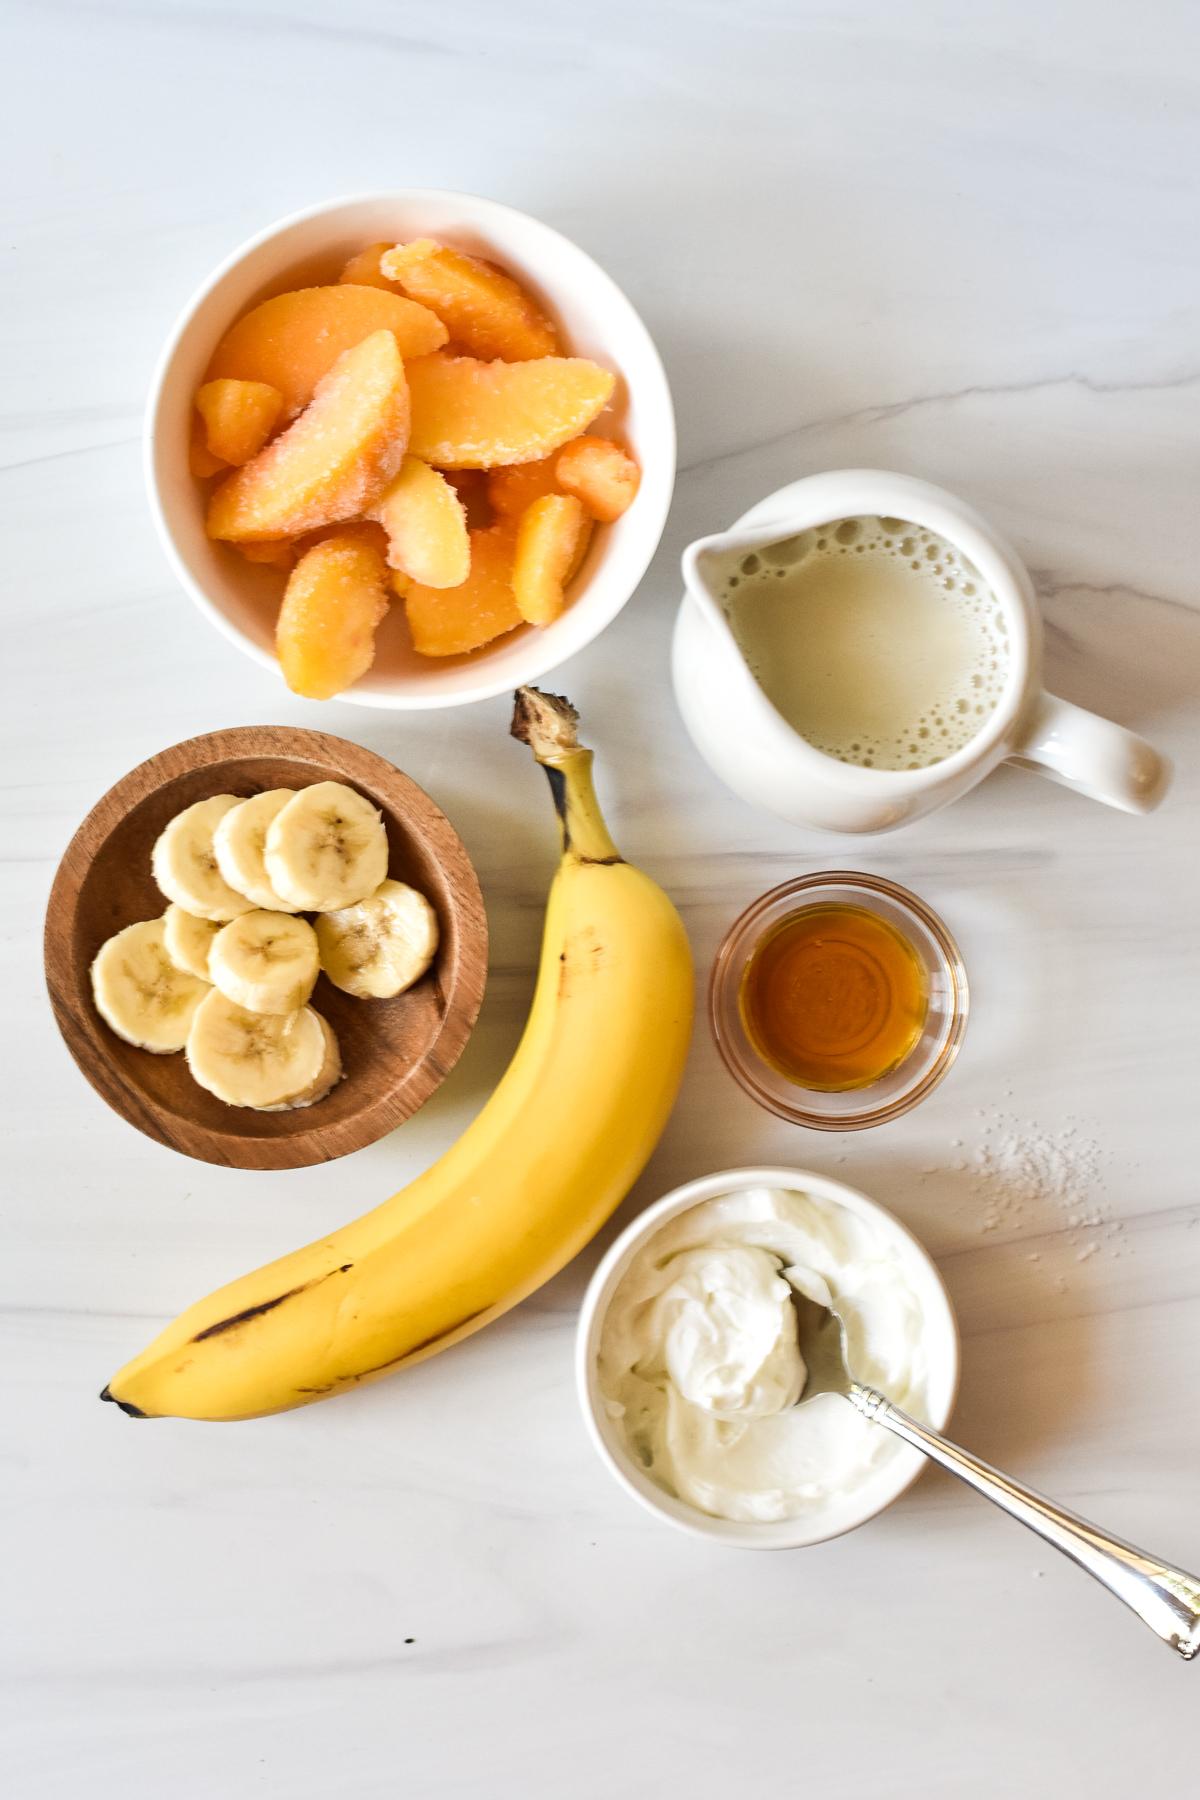 banana peach smoothie ingredients